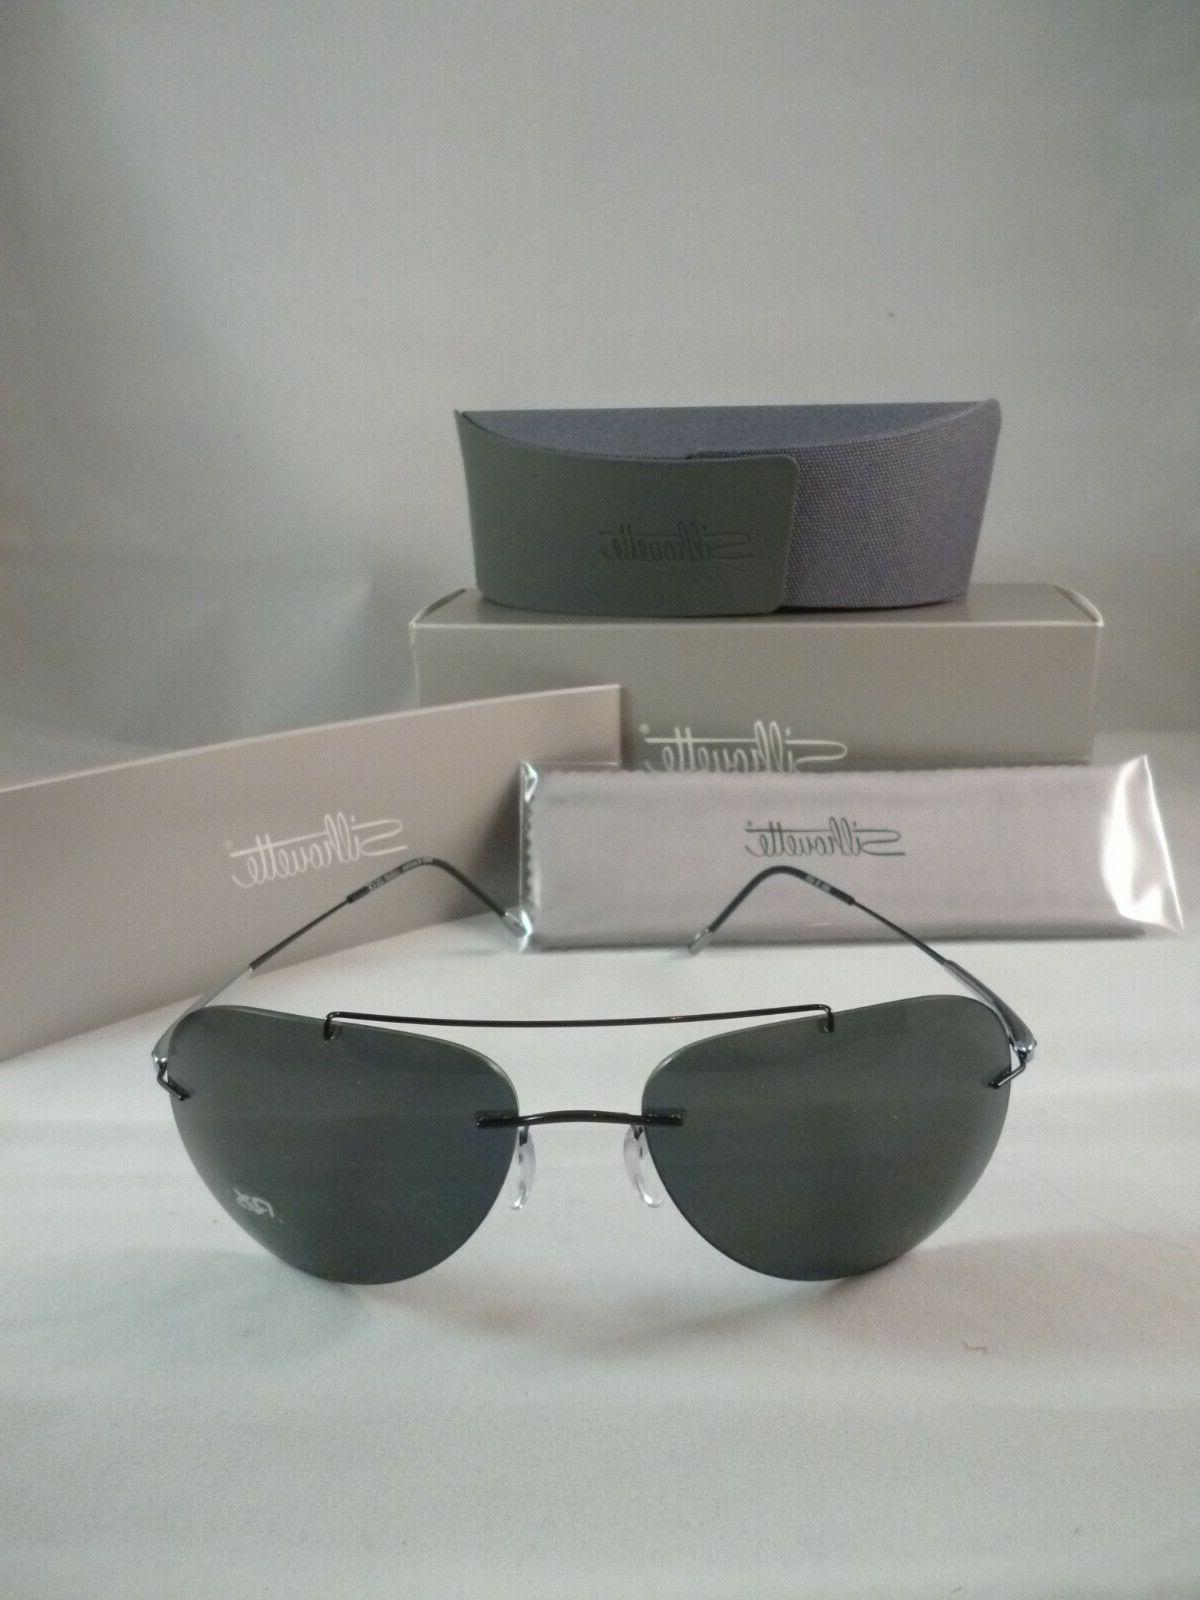 Silhouette Sunglasses 8650/S ADVENTURER Polarized 6200